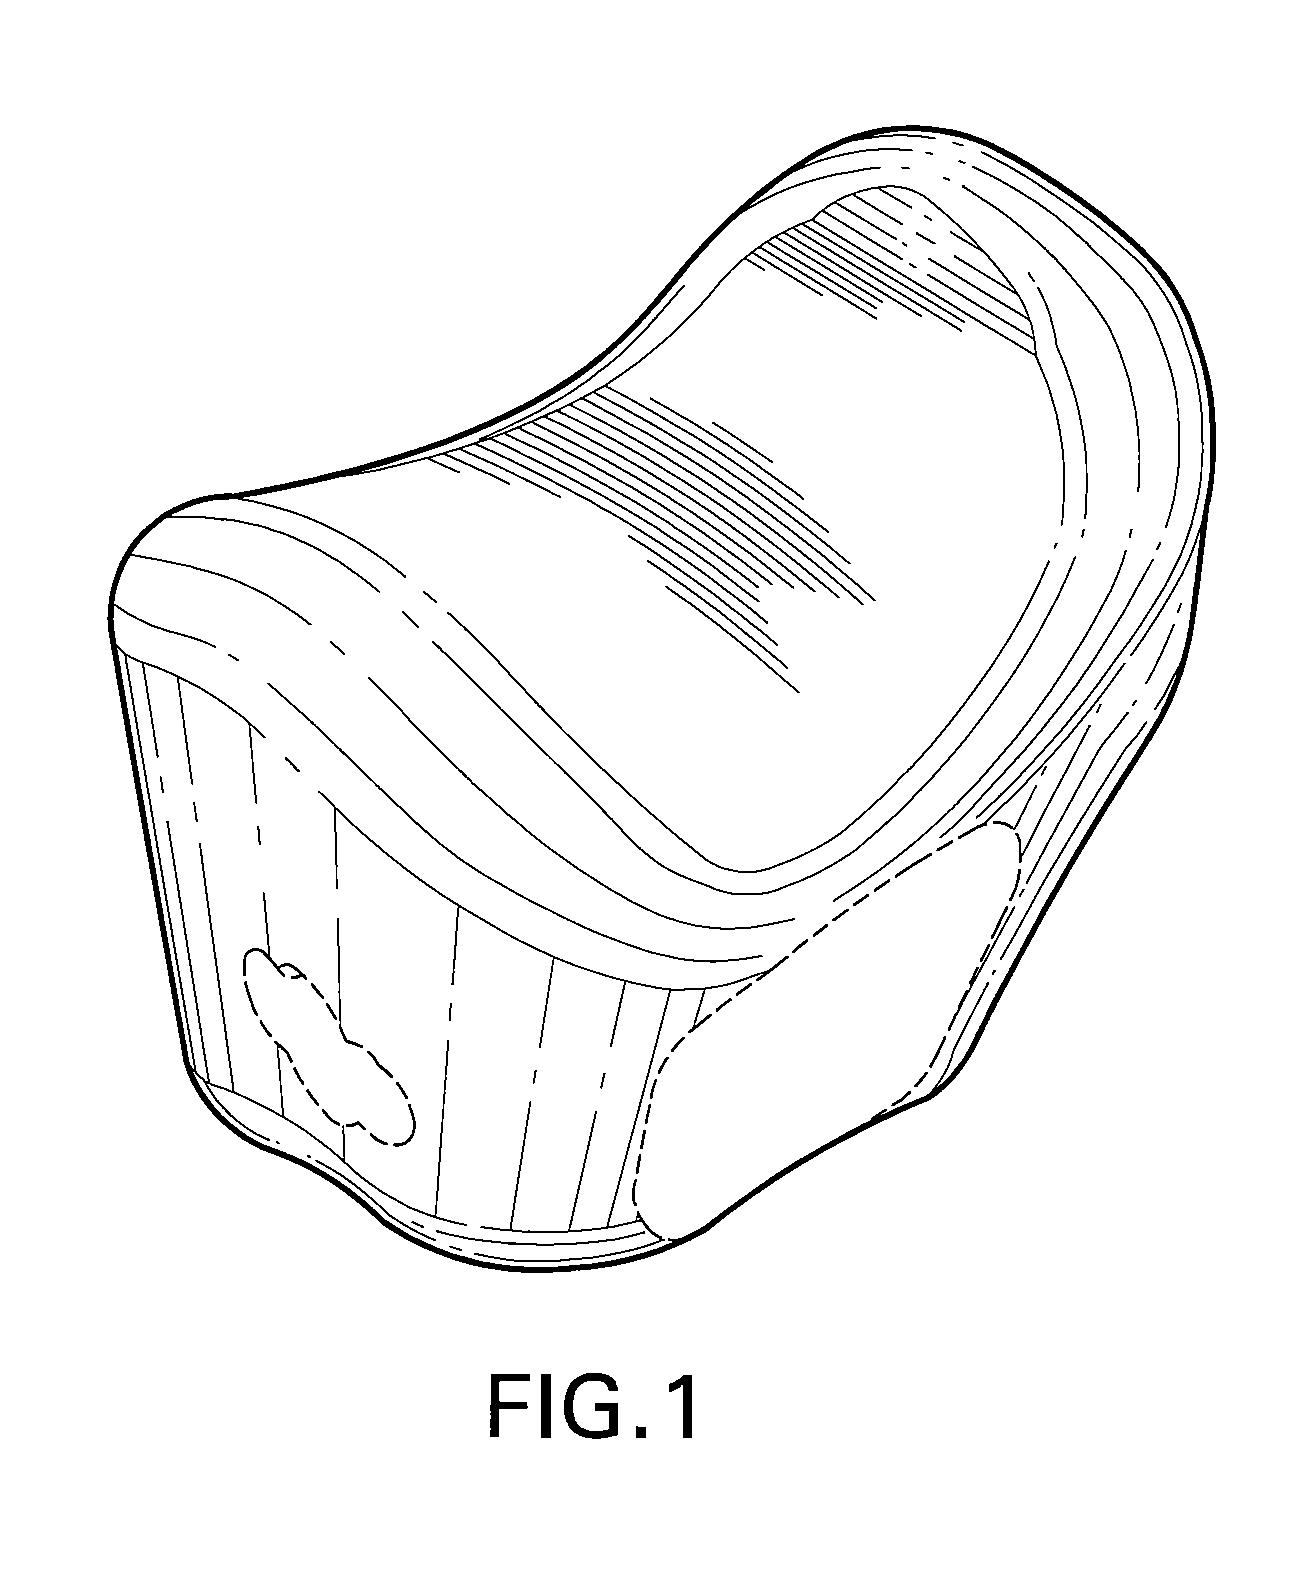 patent usd655008 trapezium prosthesis google patentsuche. Black Bedroom Furniture Sets. Home Design Ideas